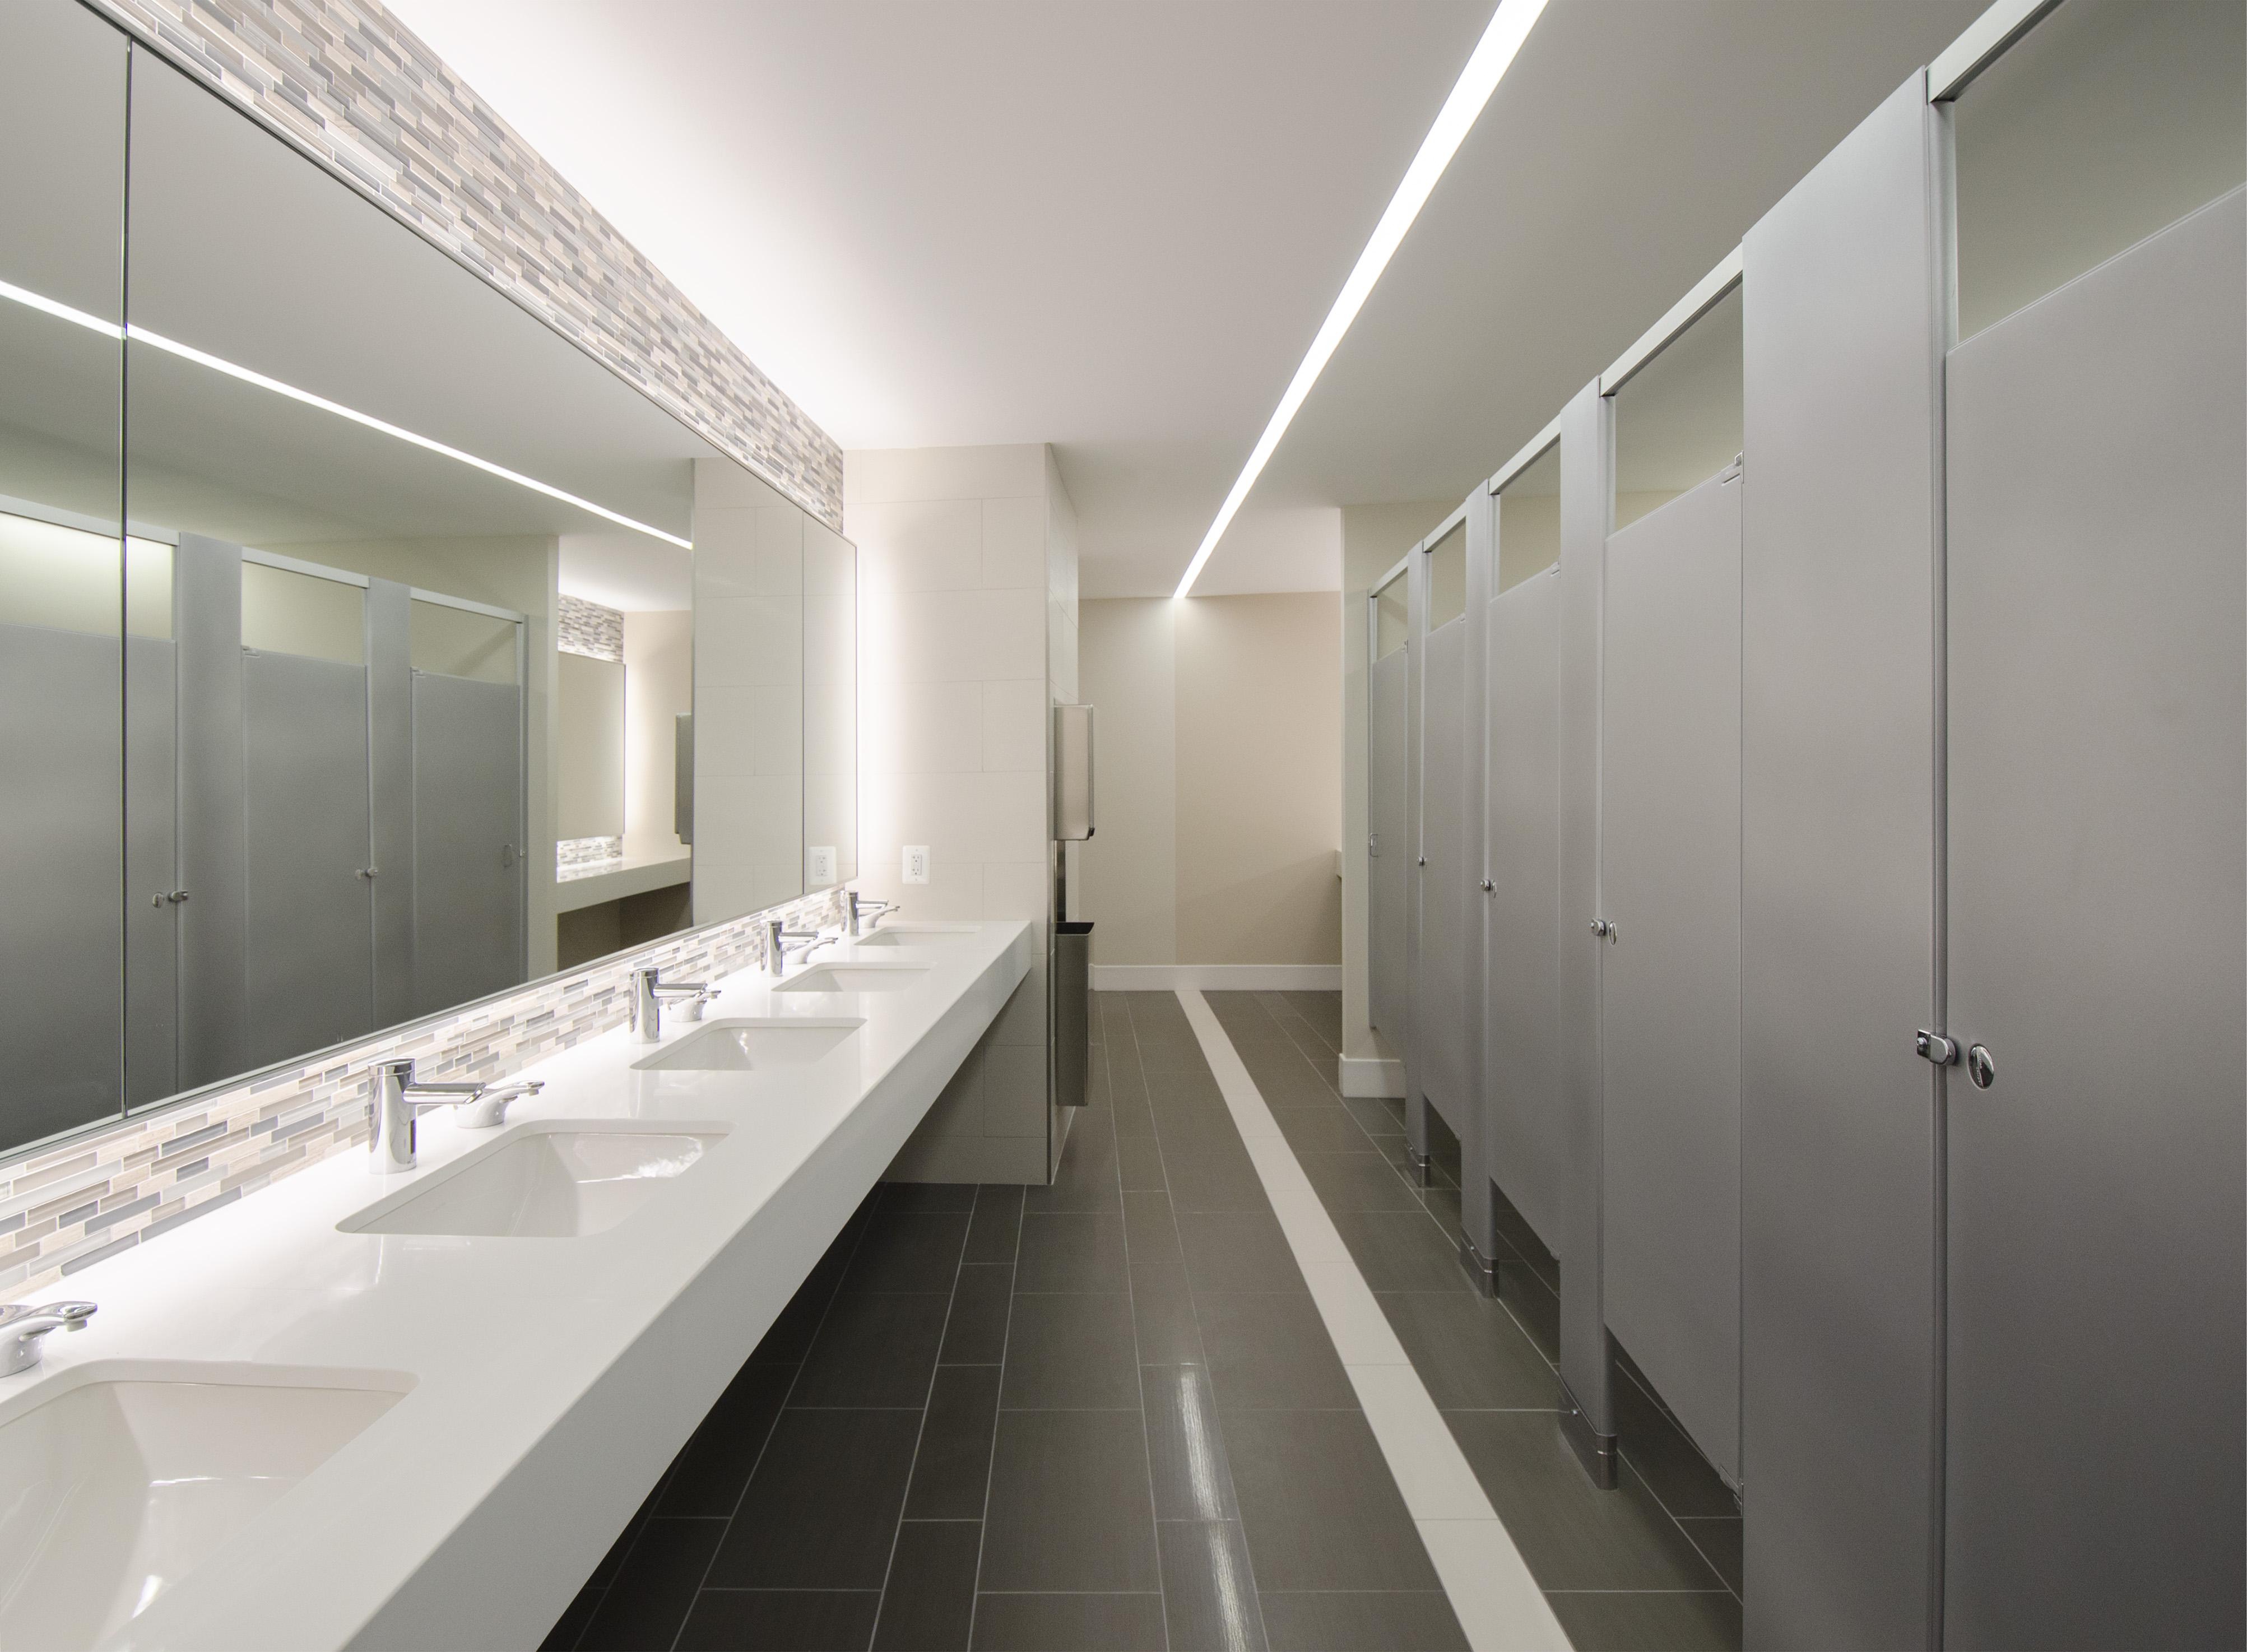 Excellent Lowes Bathtub Drain Stopper Tiny Walk In Shower Small Bathroom Clean Bathroom Suppliers London Ontario Bath And Shower Enclosures Old Delta Bathroom Sink Faucet Parts Diagram GrayRoman Bath London Wiki Troiano Enterprises, Inc